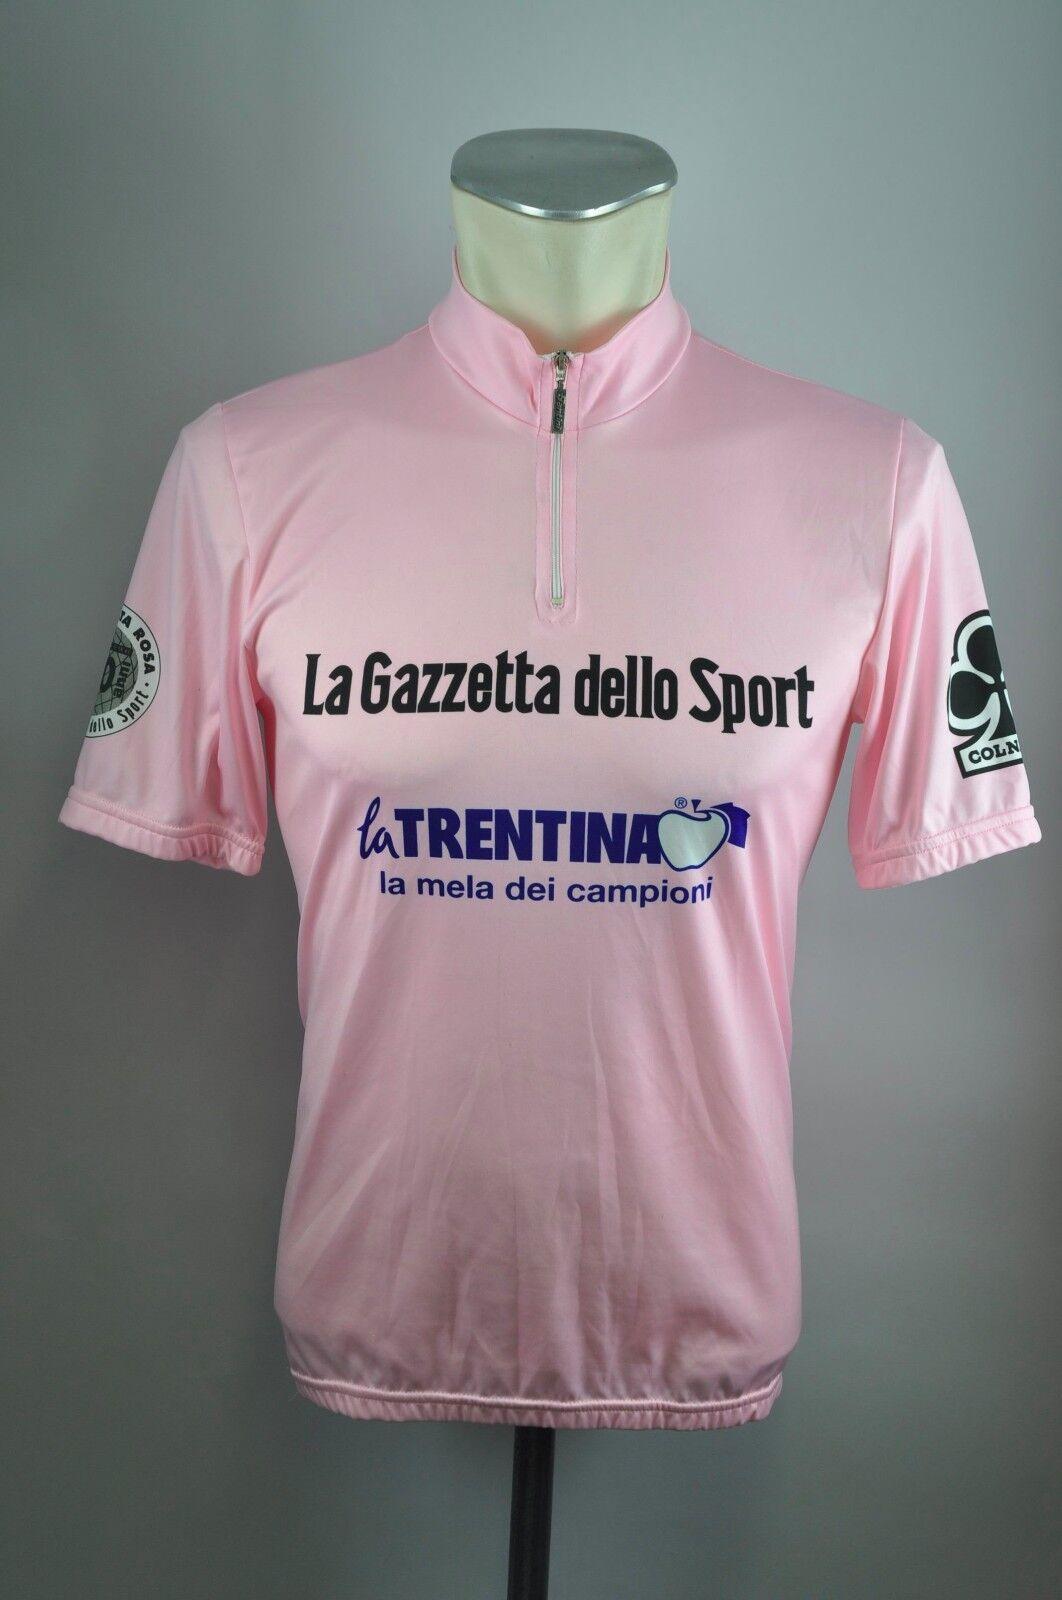 Santini La Gazzetta Trentina Radtrikot cycling jersey Trikot Gr. M BW 50cm KE1